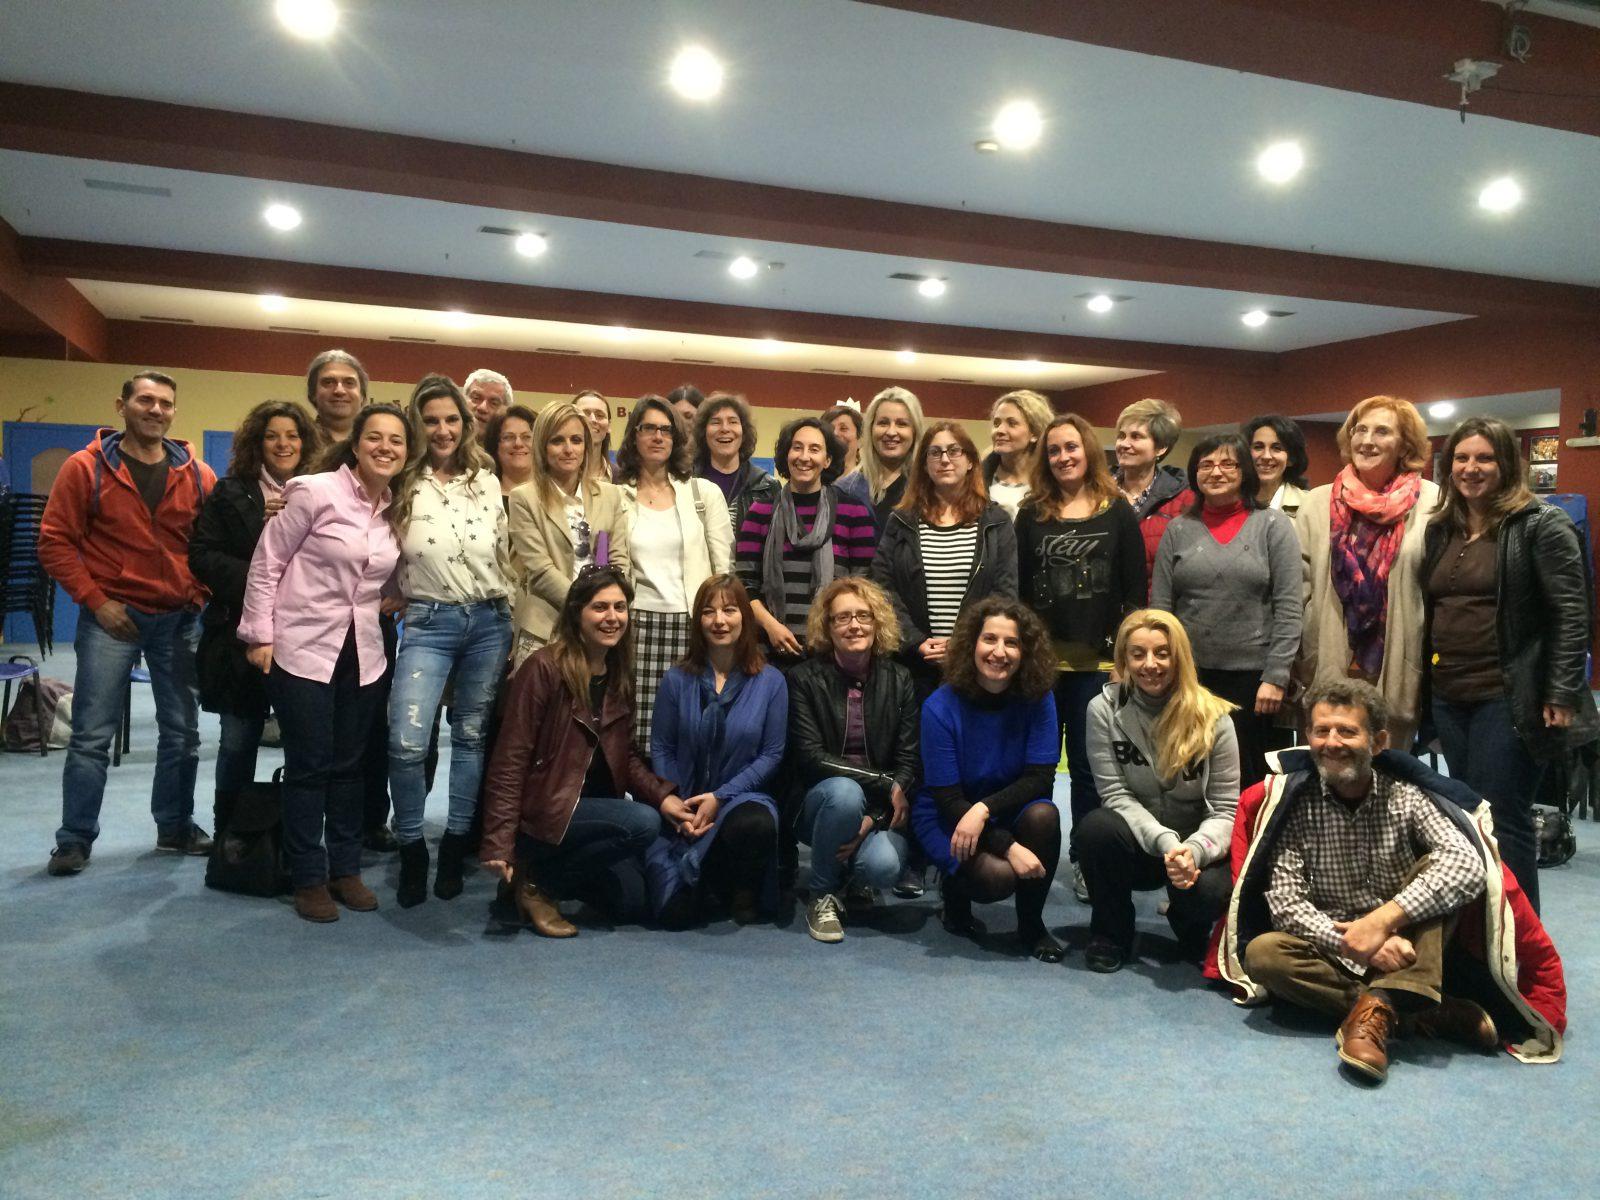 Choir workshop for Music Educators